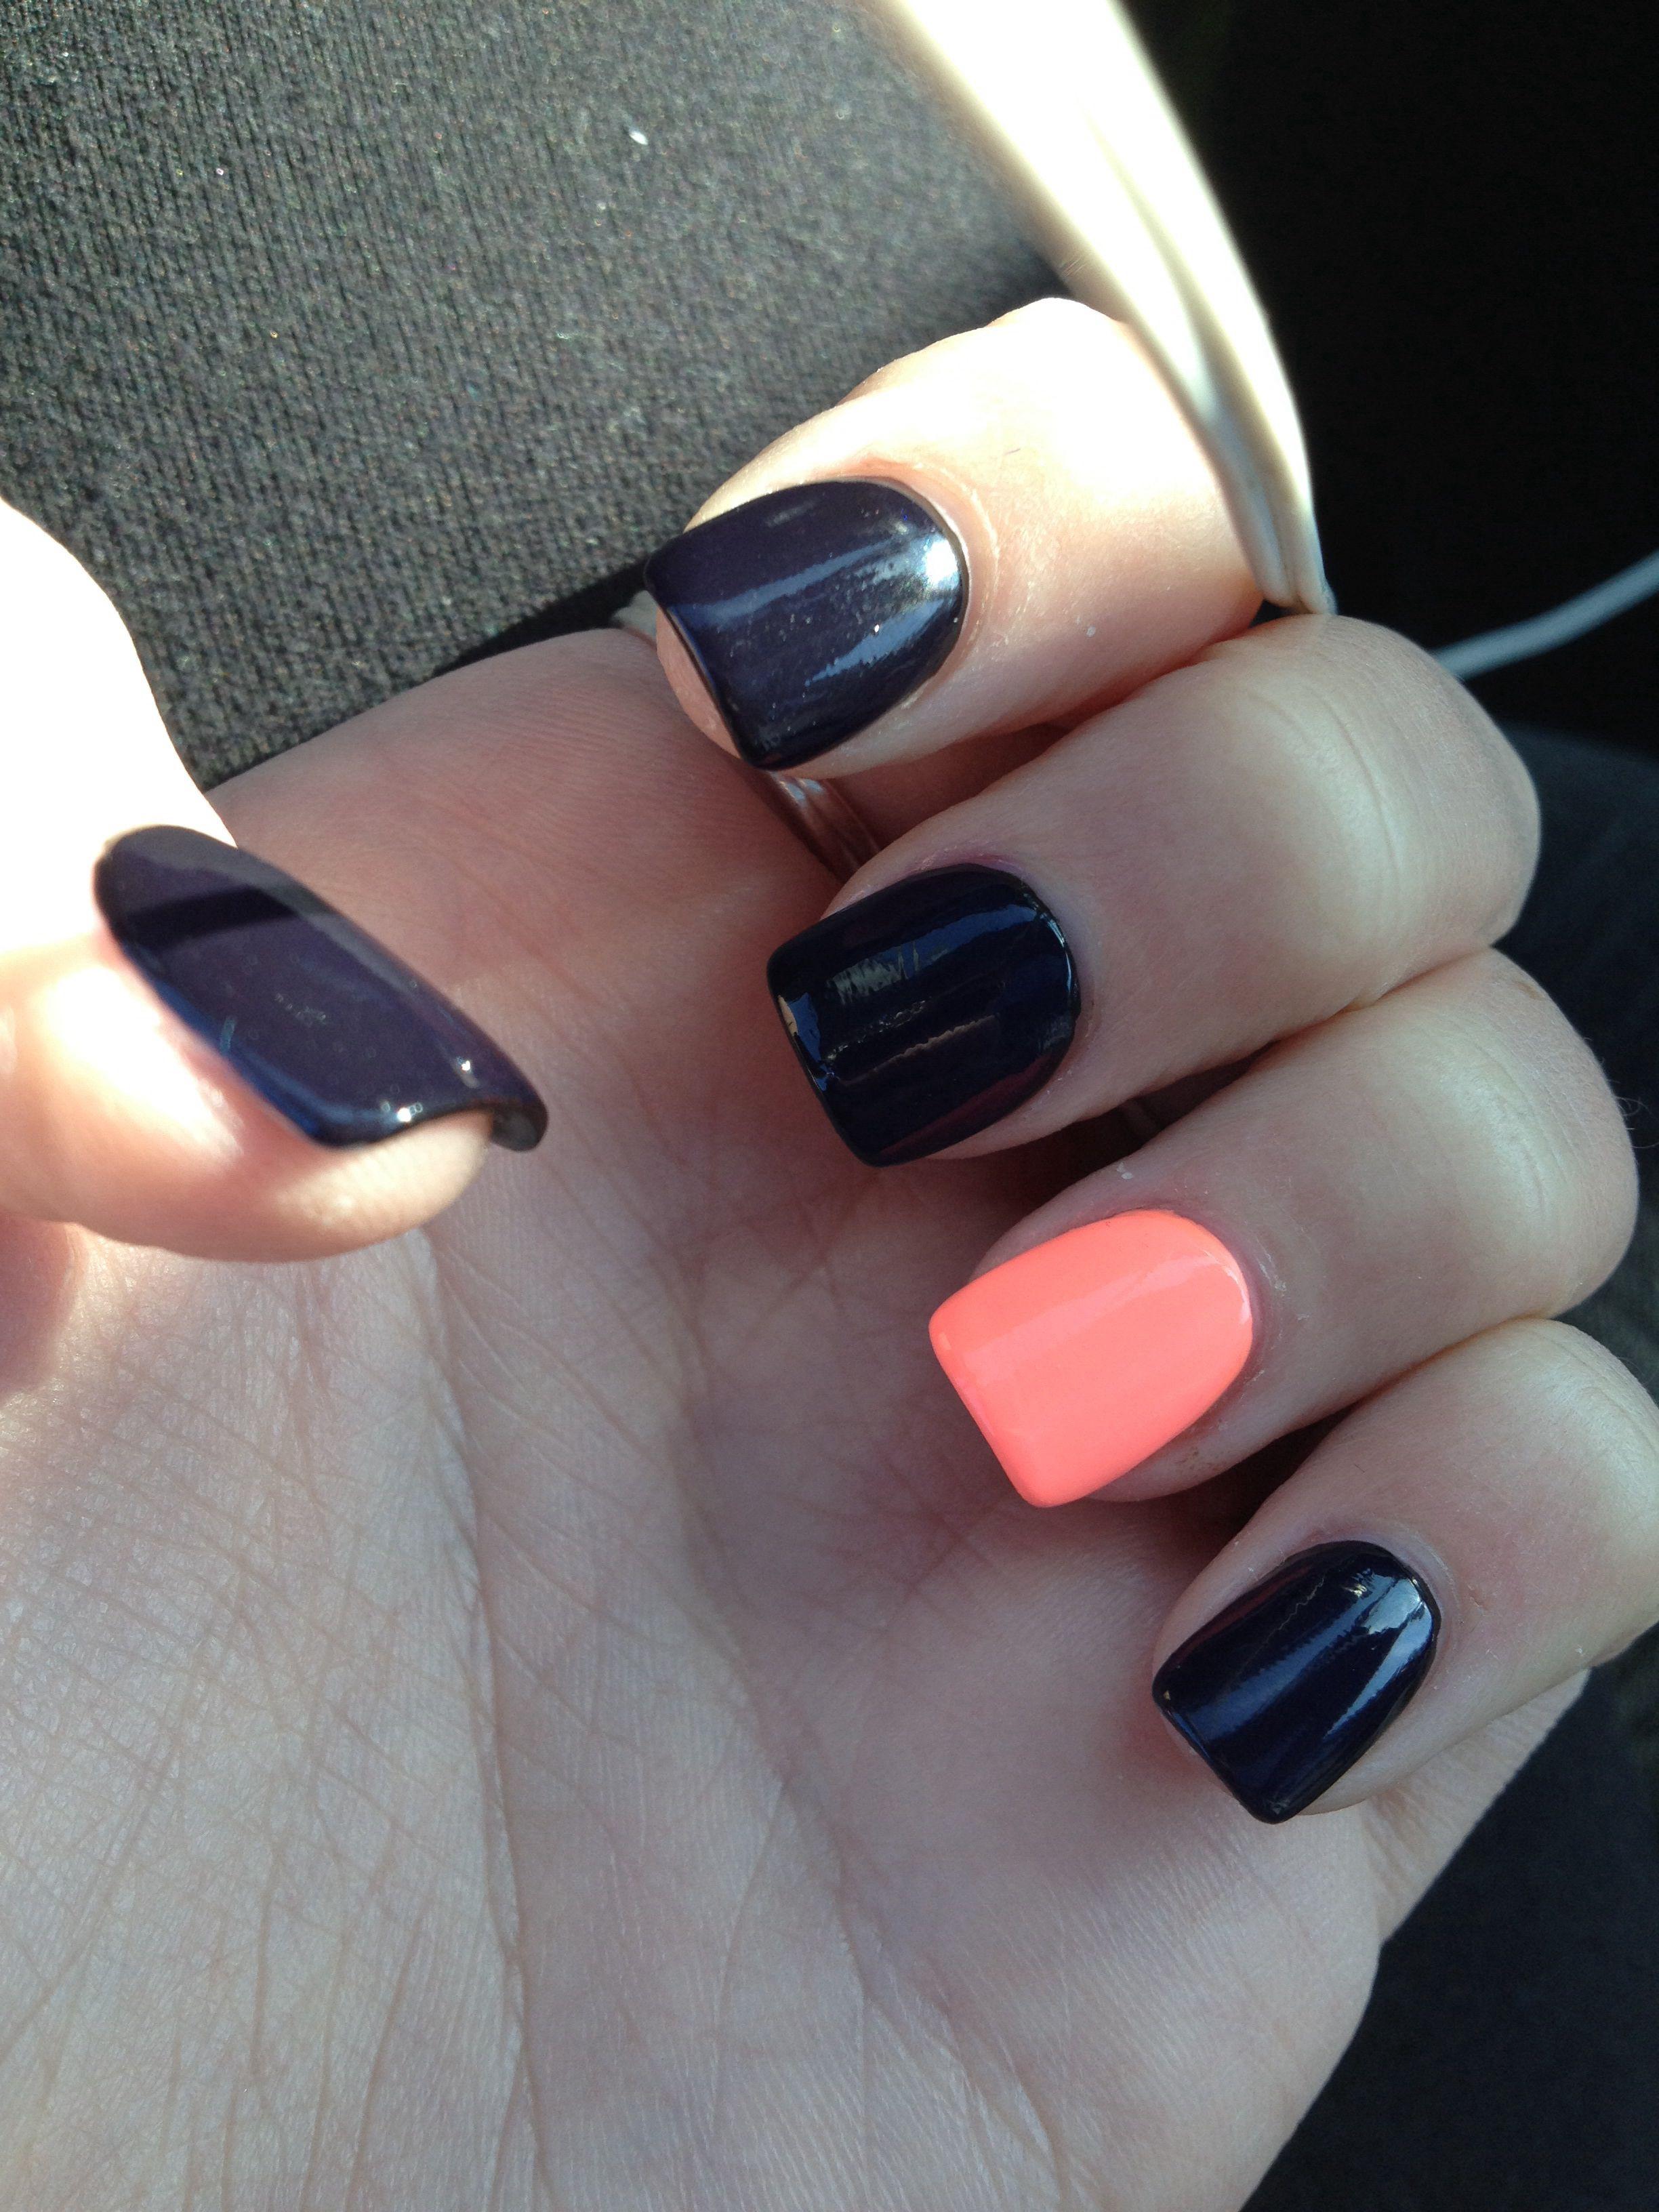 Fancy Nails #nails #2014 #designs